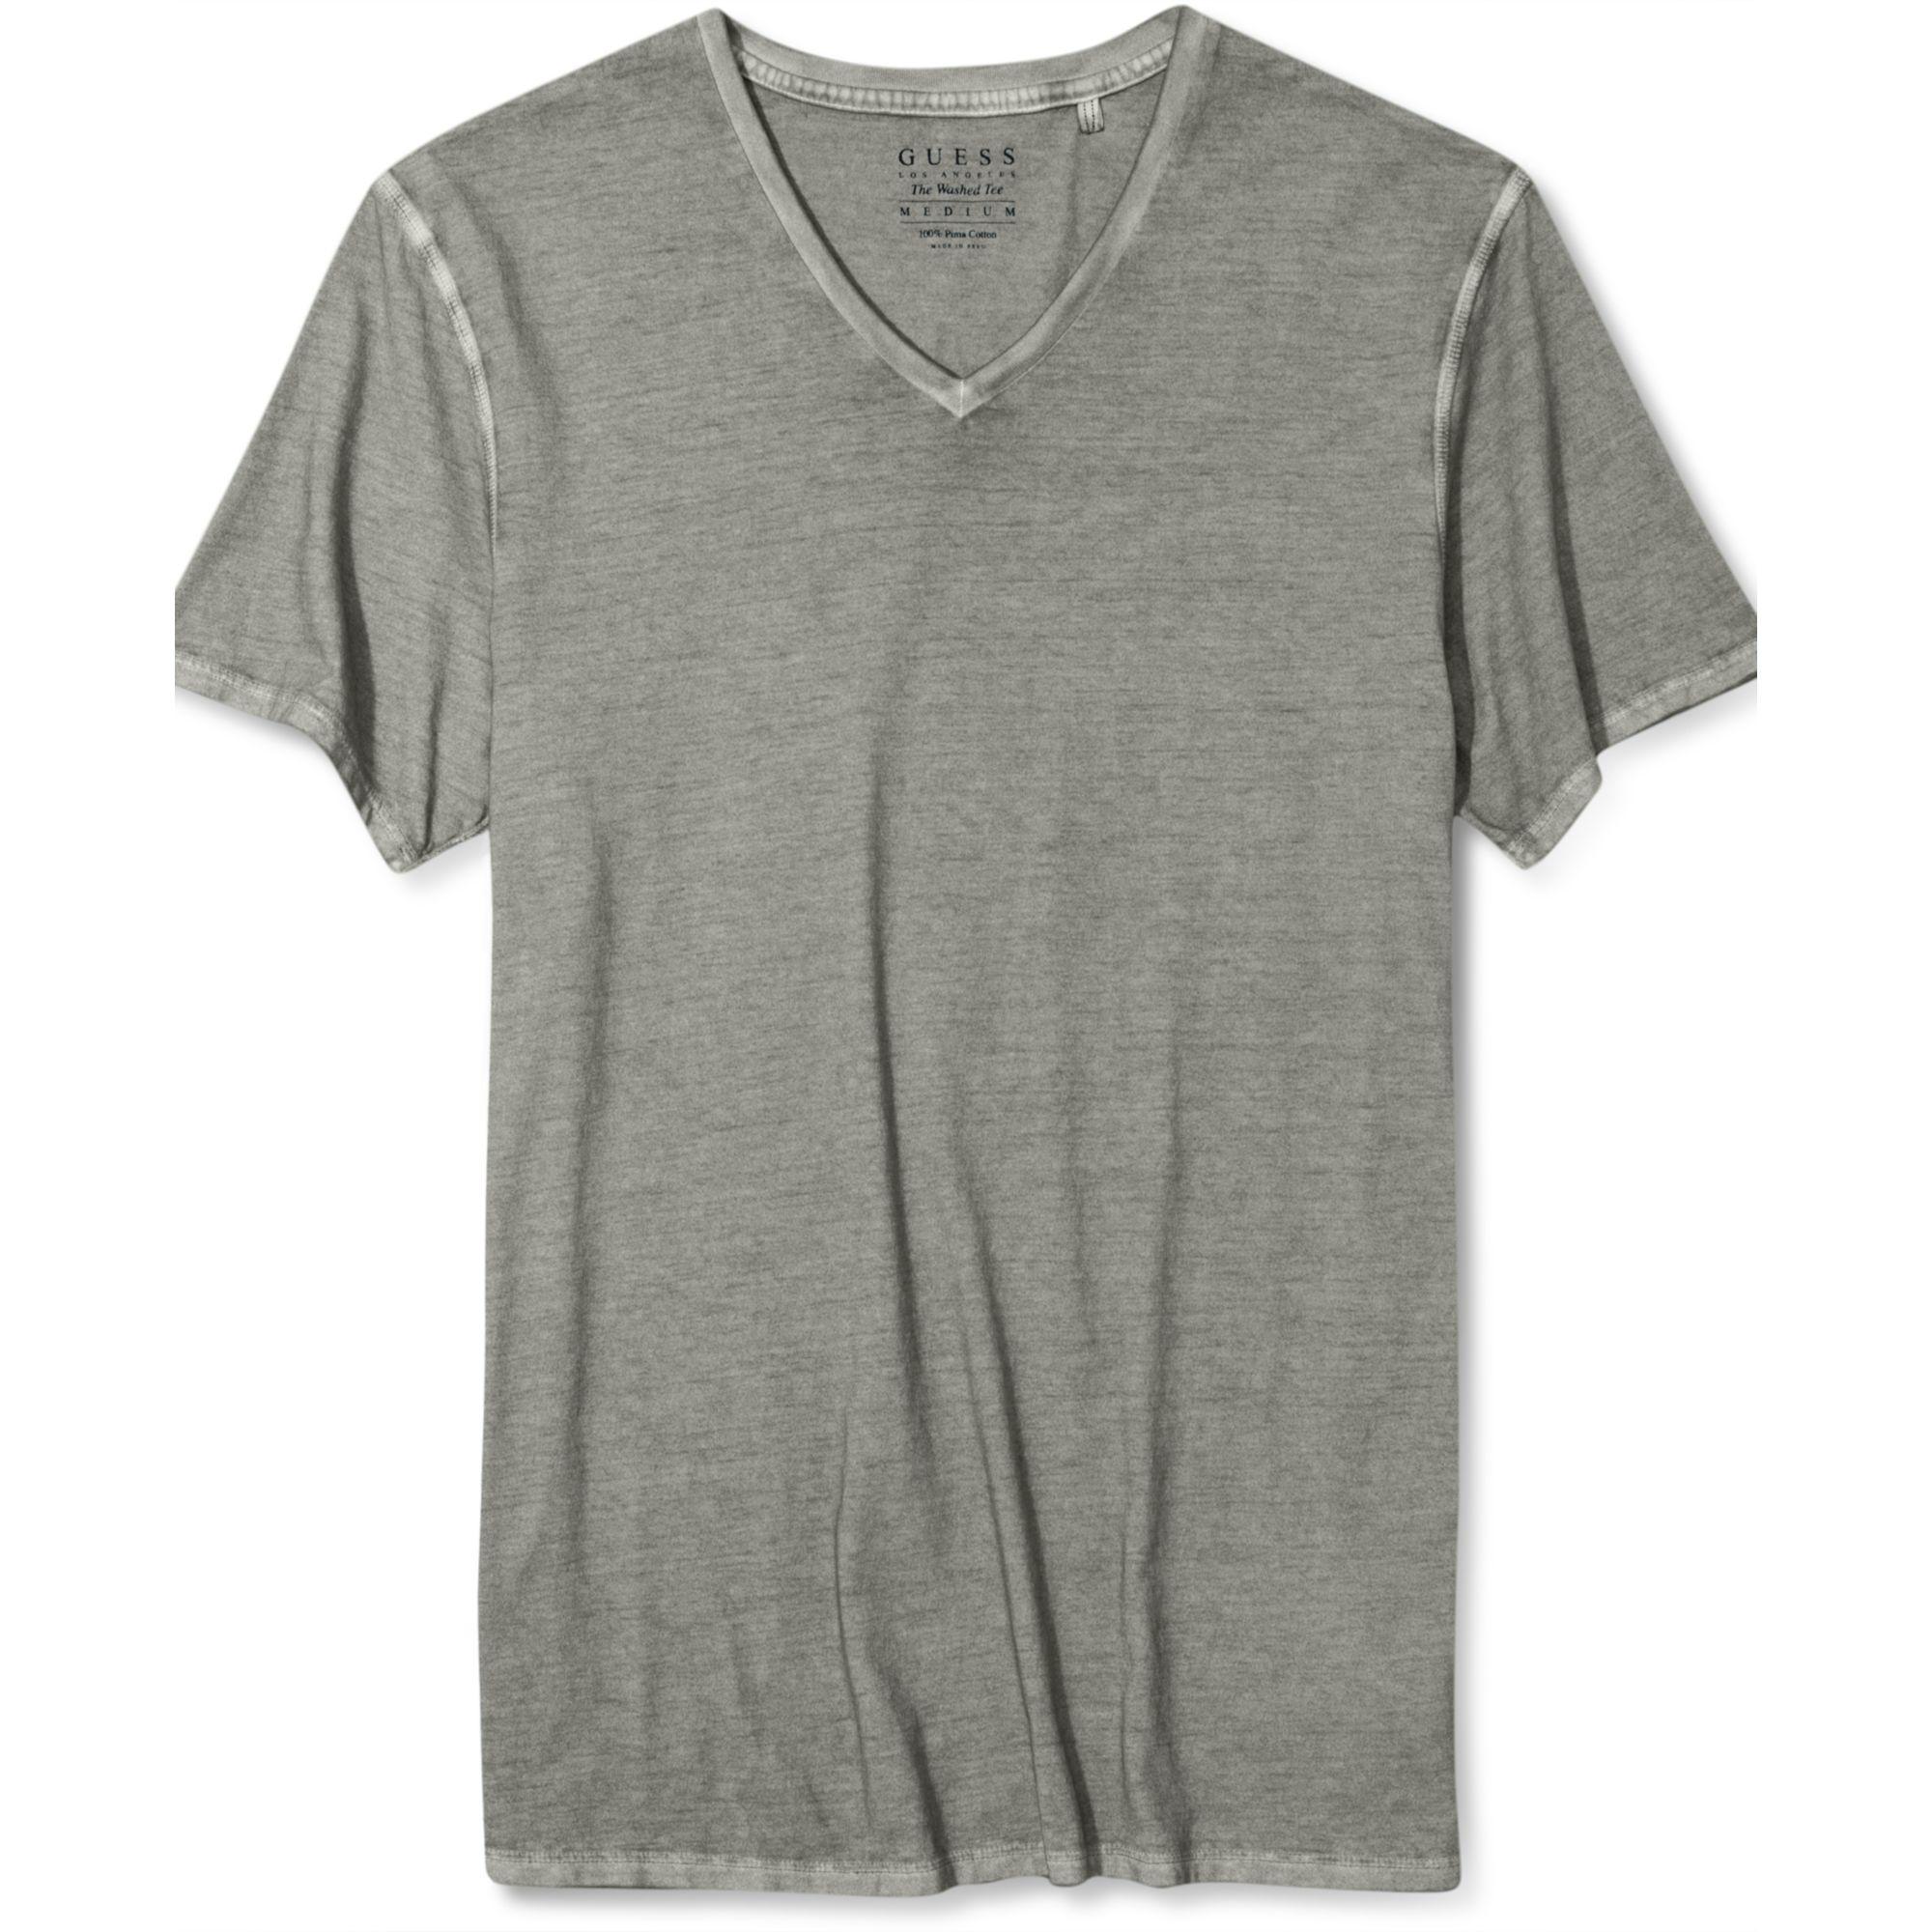 guess shirt gunnar vneck tshirt in gray for men lyst. Black Bedroom Furniture Sets. Home Design Ideas